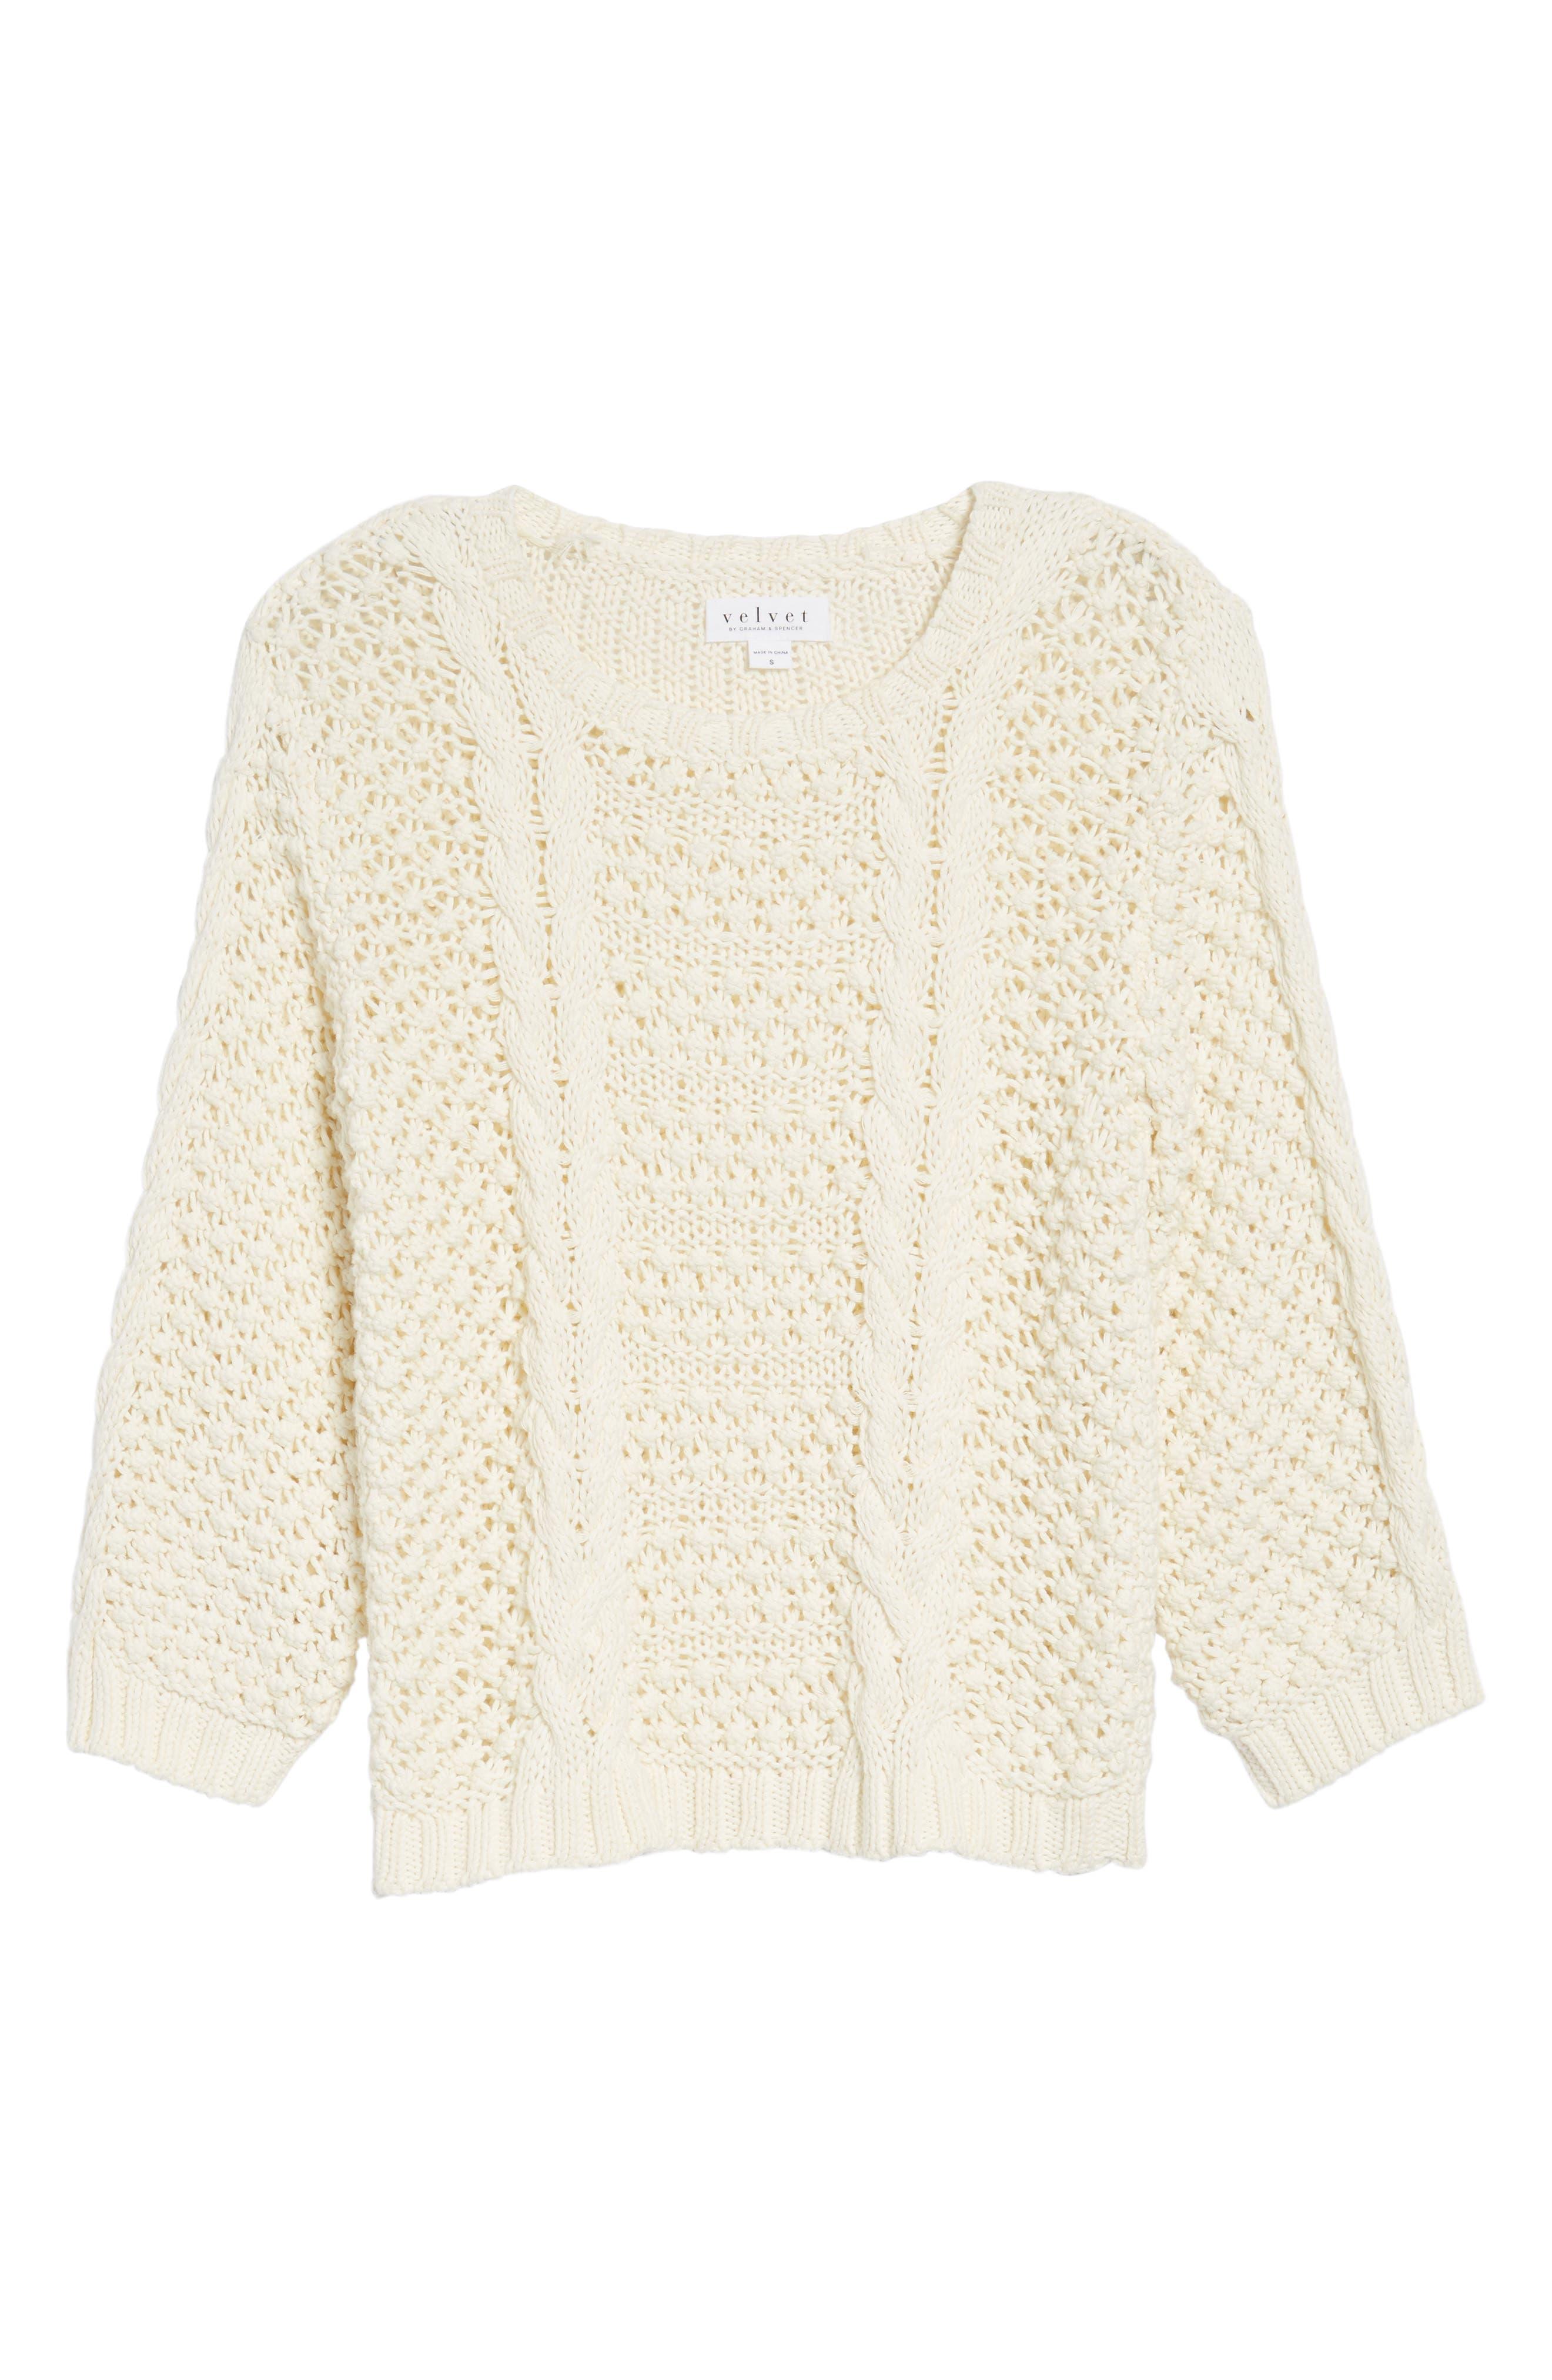 Popcorn Cable Sweater,                             Alternate thumbnail 6, color,                             Milk White